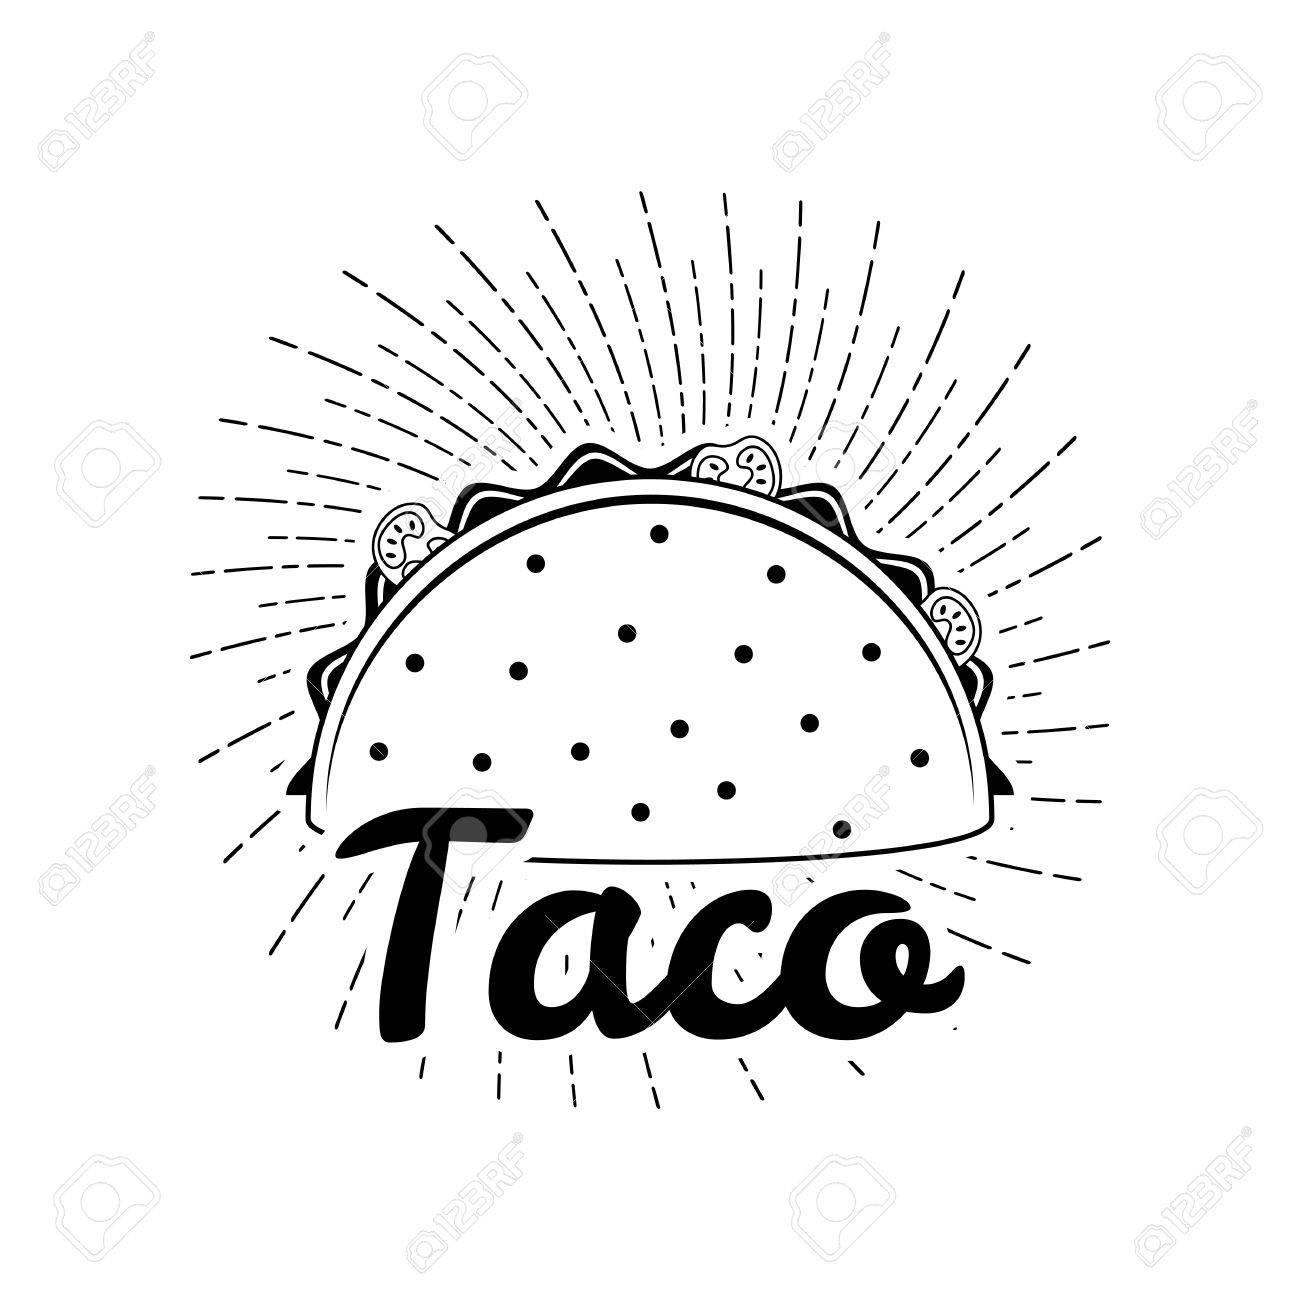 1300x1300 Taco Illustration On White Background, Isolated. Mexico Food